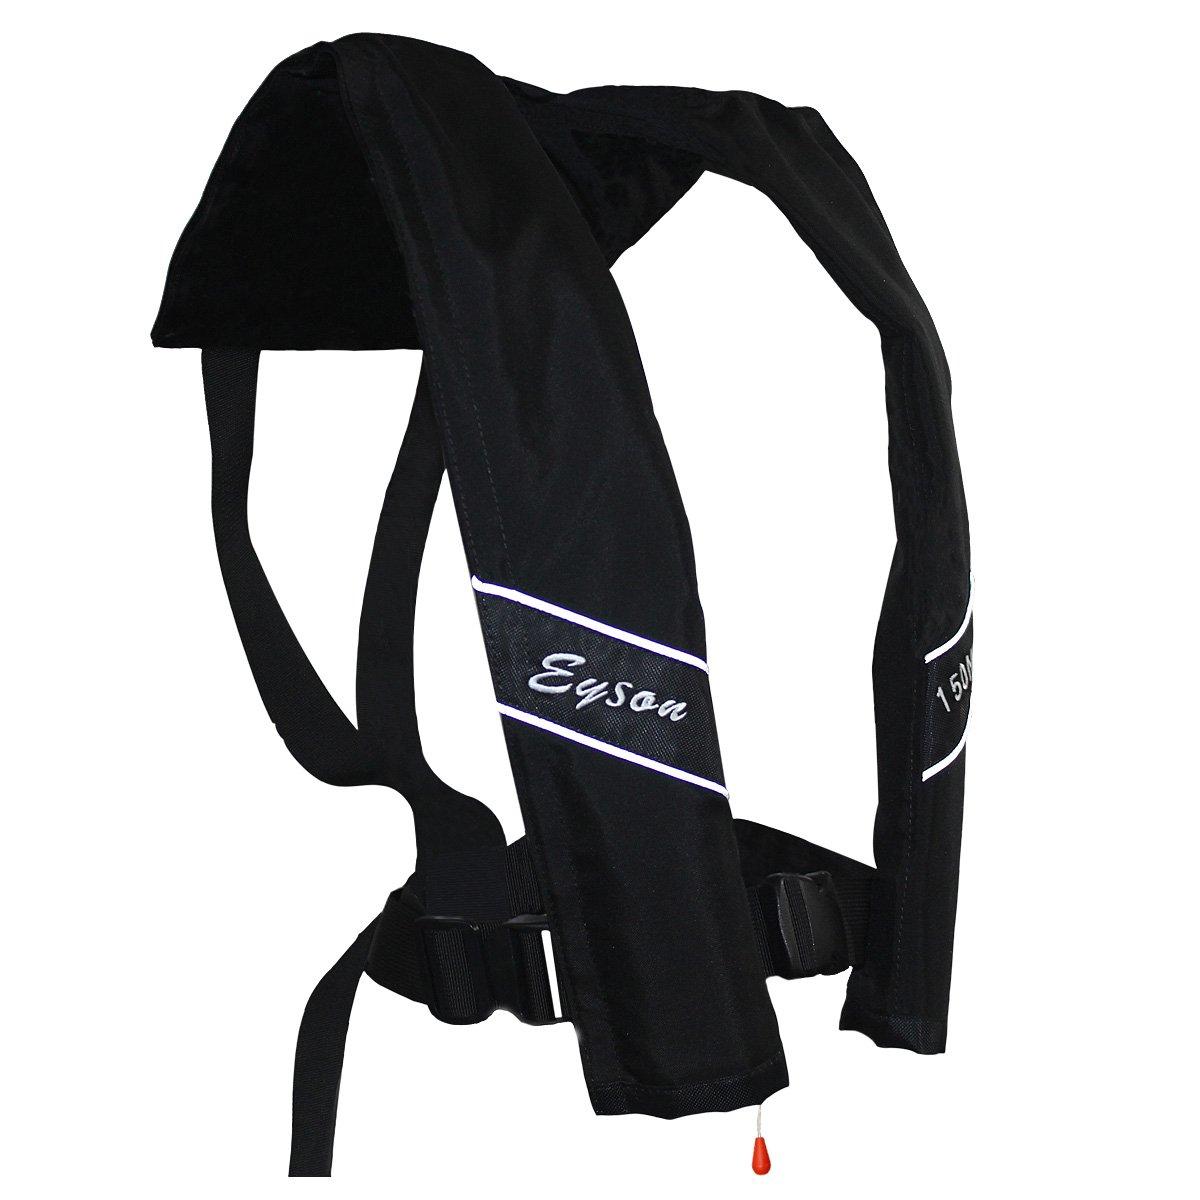 Eyson Slim Inflatable PFD Life Jacket Life Vest Adult Automatic (Black)